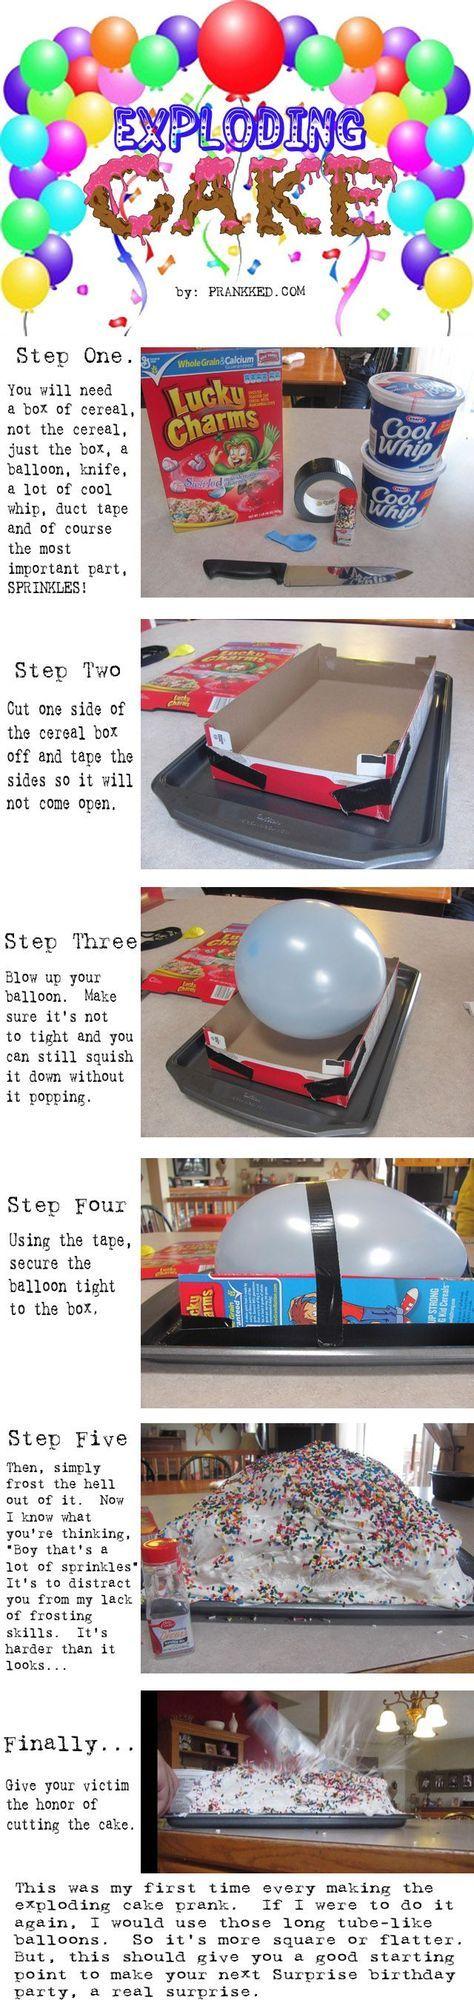 exploding cake..very fun idea